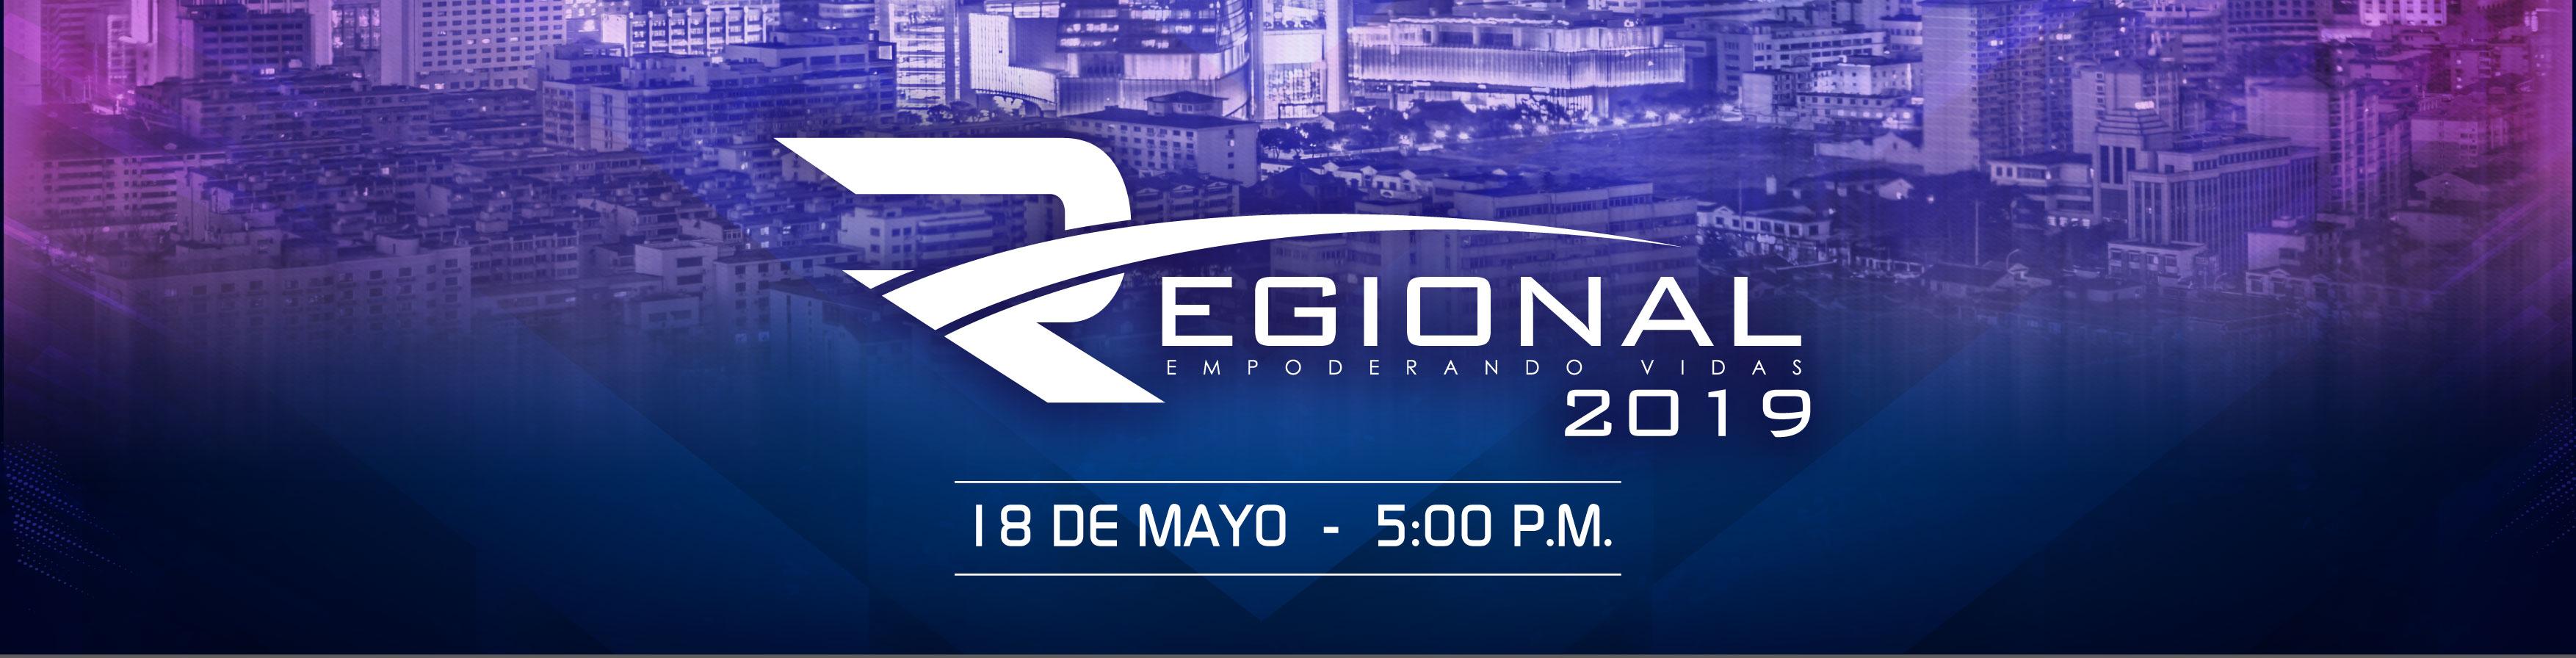 Regional-2-web-002